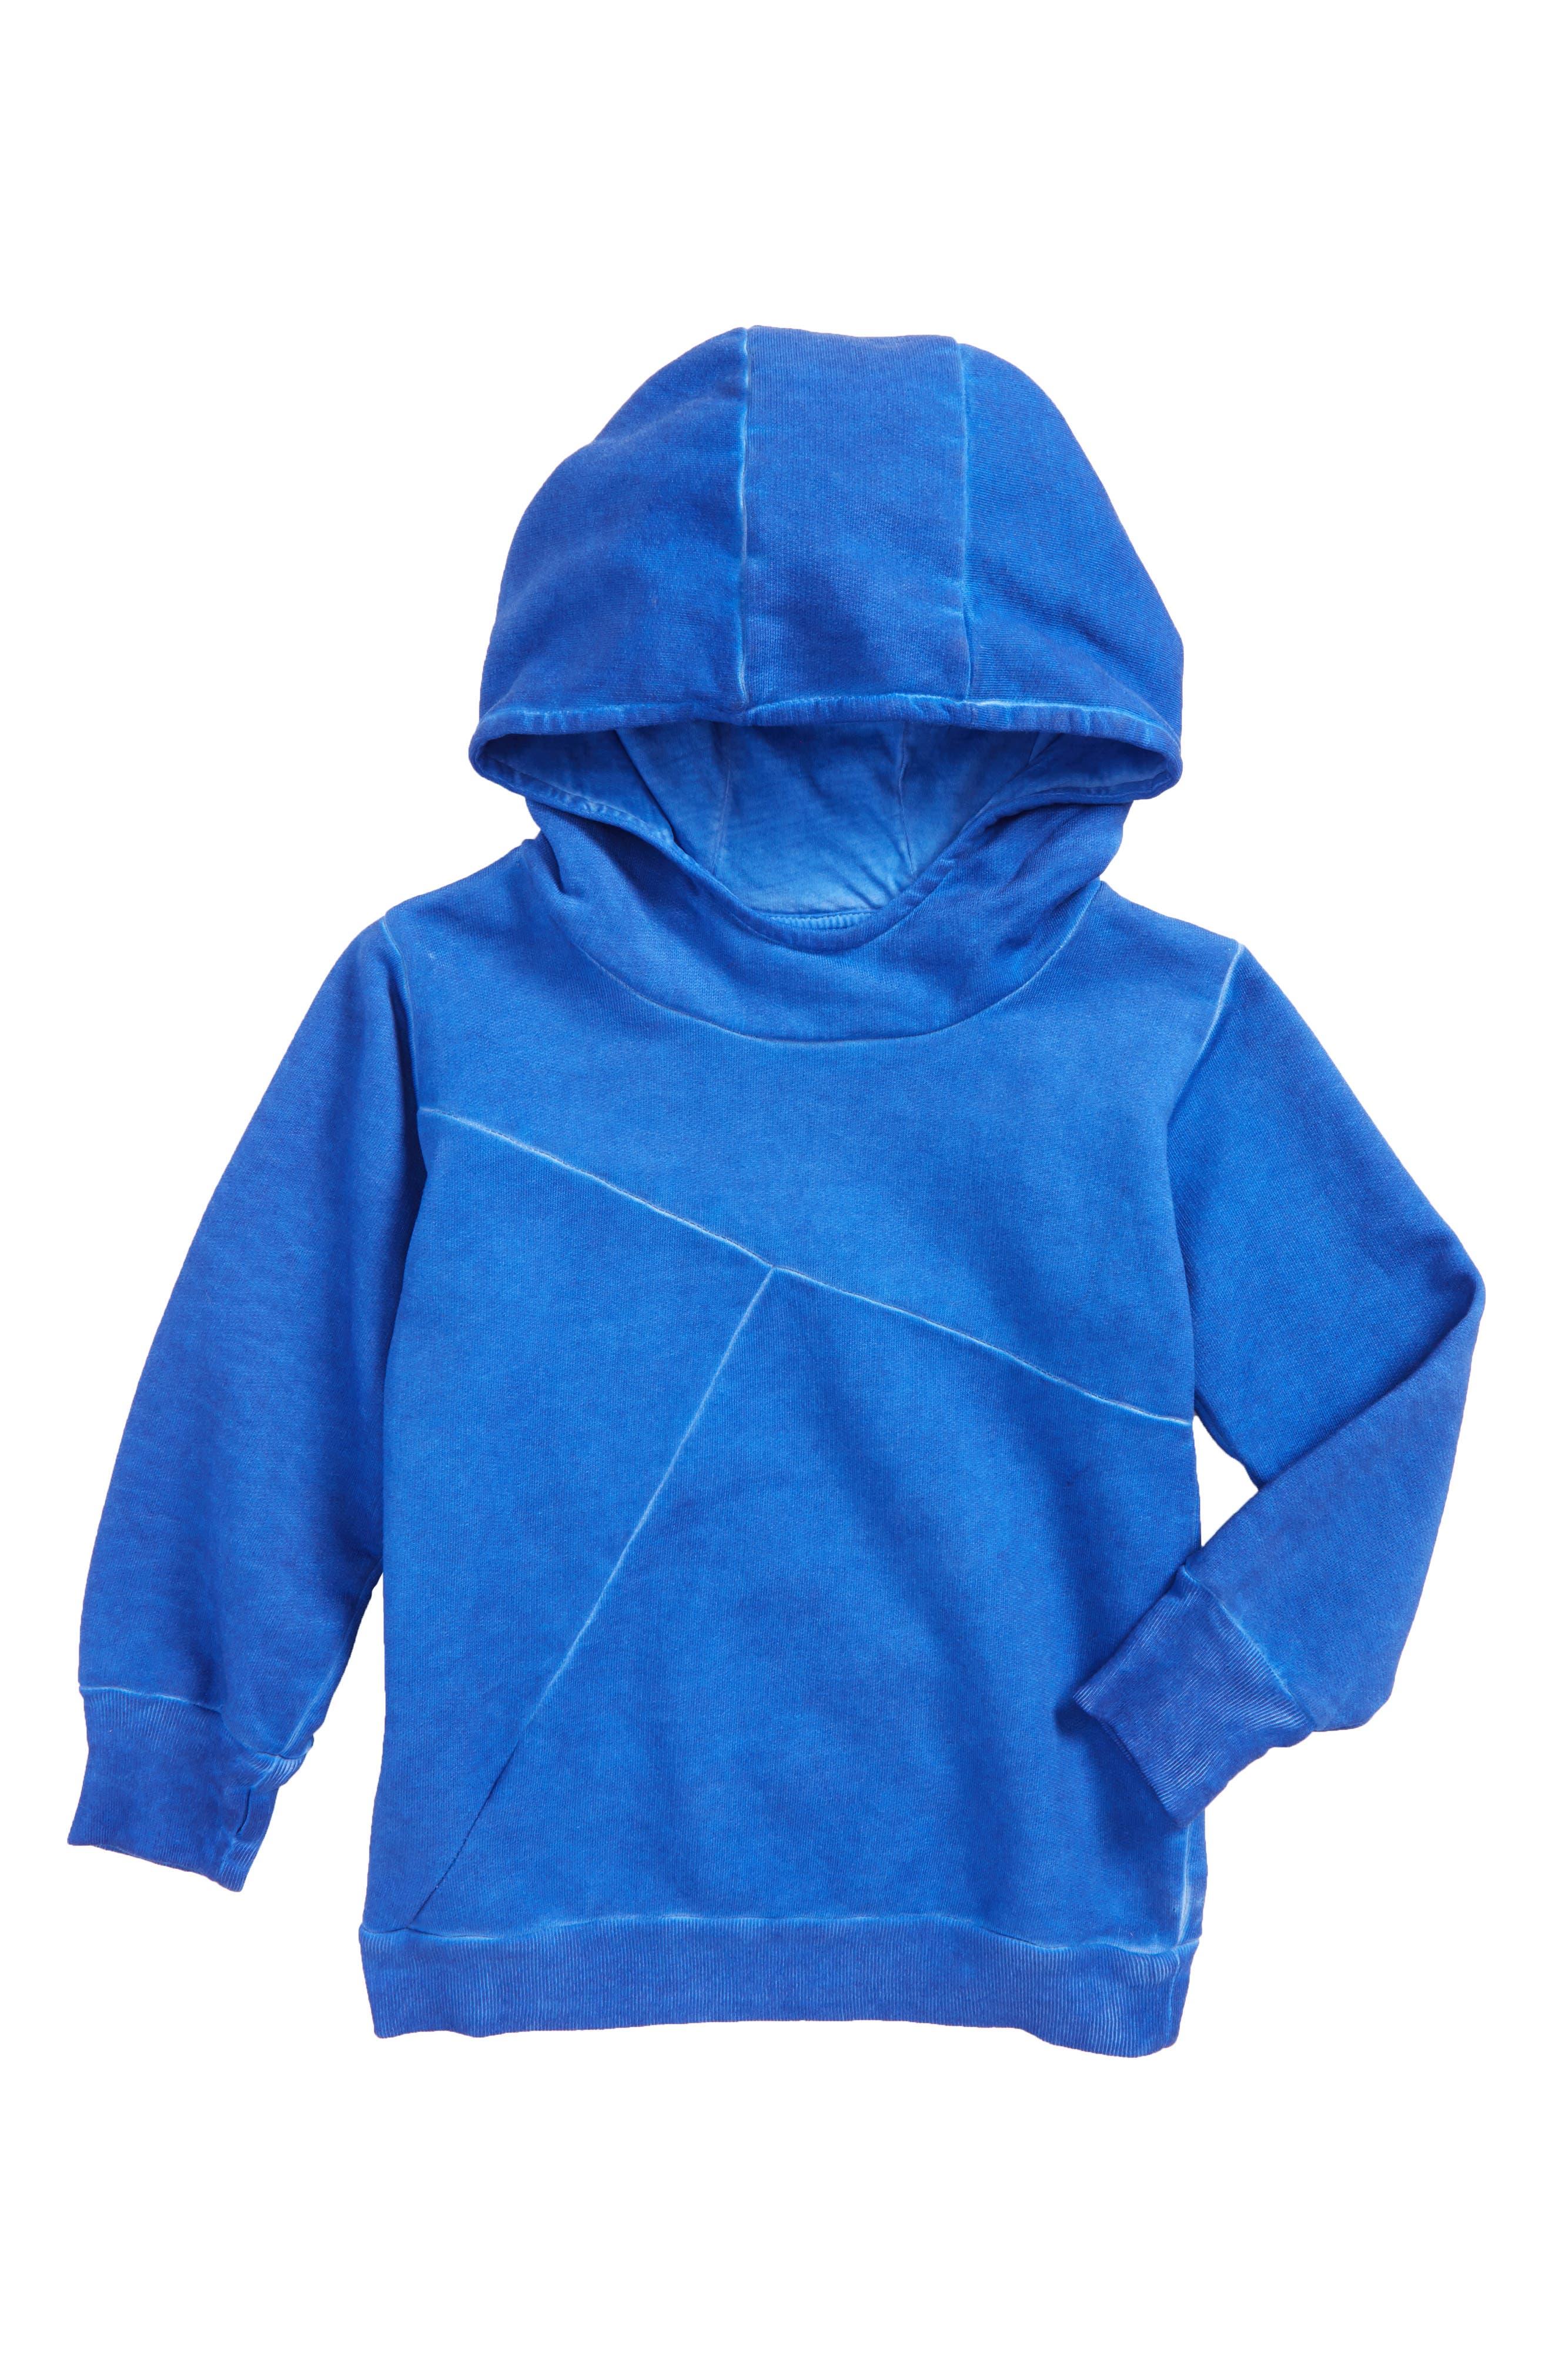 Alternate Image 1 Selected - NUNUNU Numbered Hoodie (Toddler Boys & Little Boys)